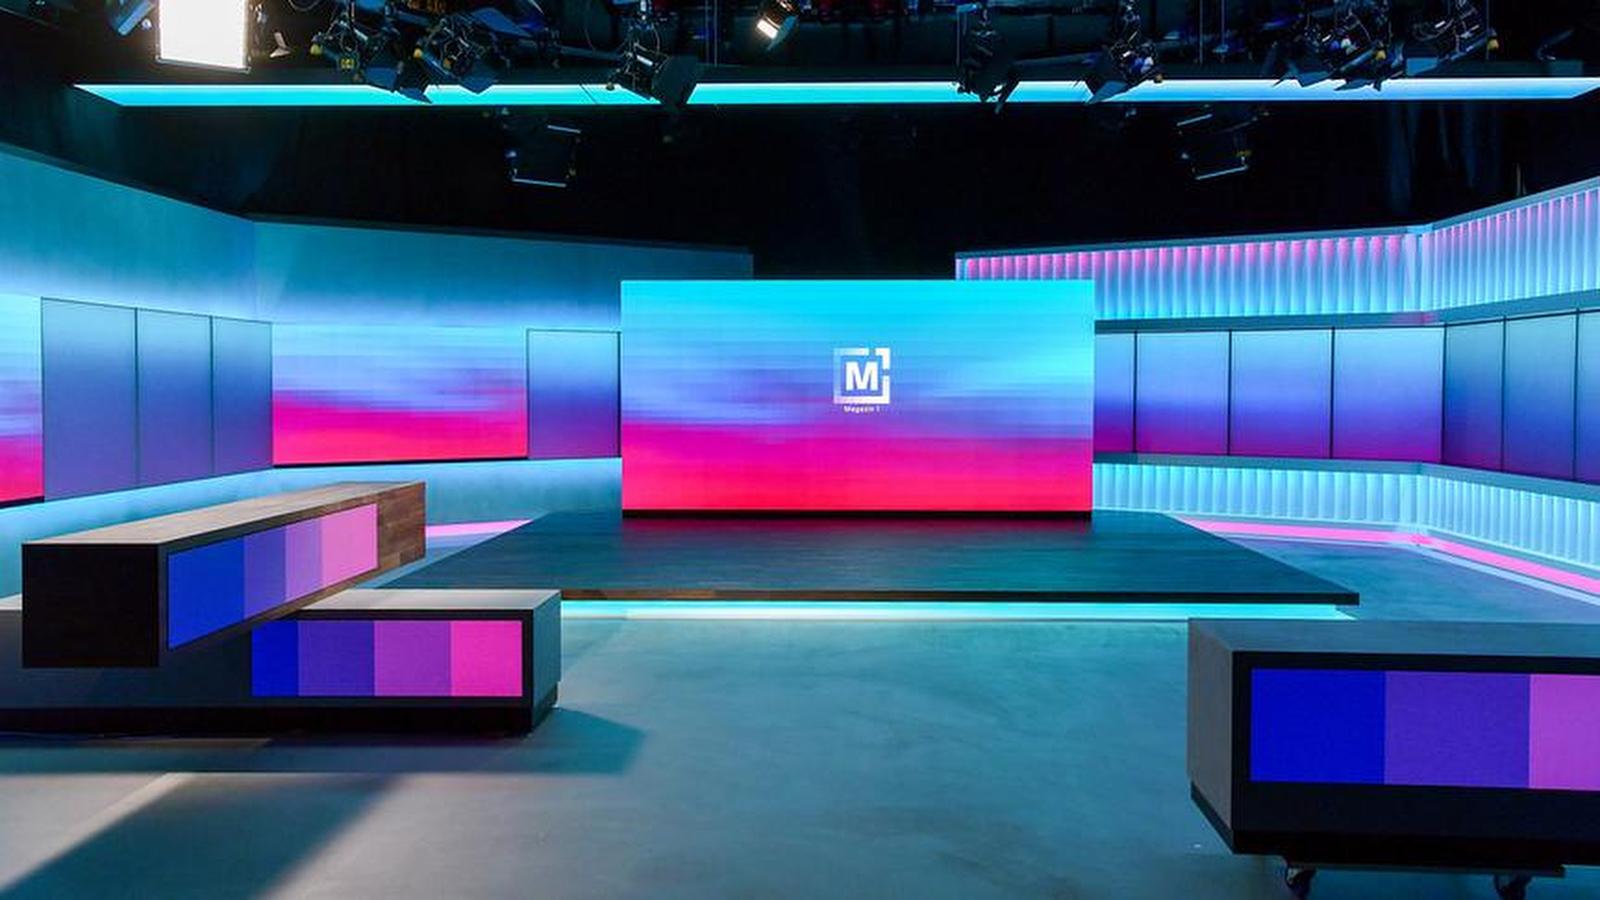 NCS_ORF-Veech-2019_0001